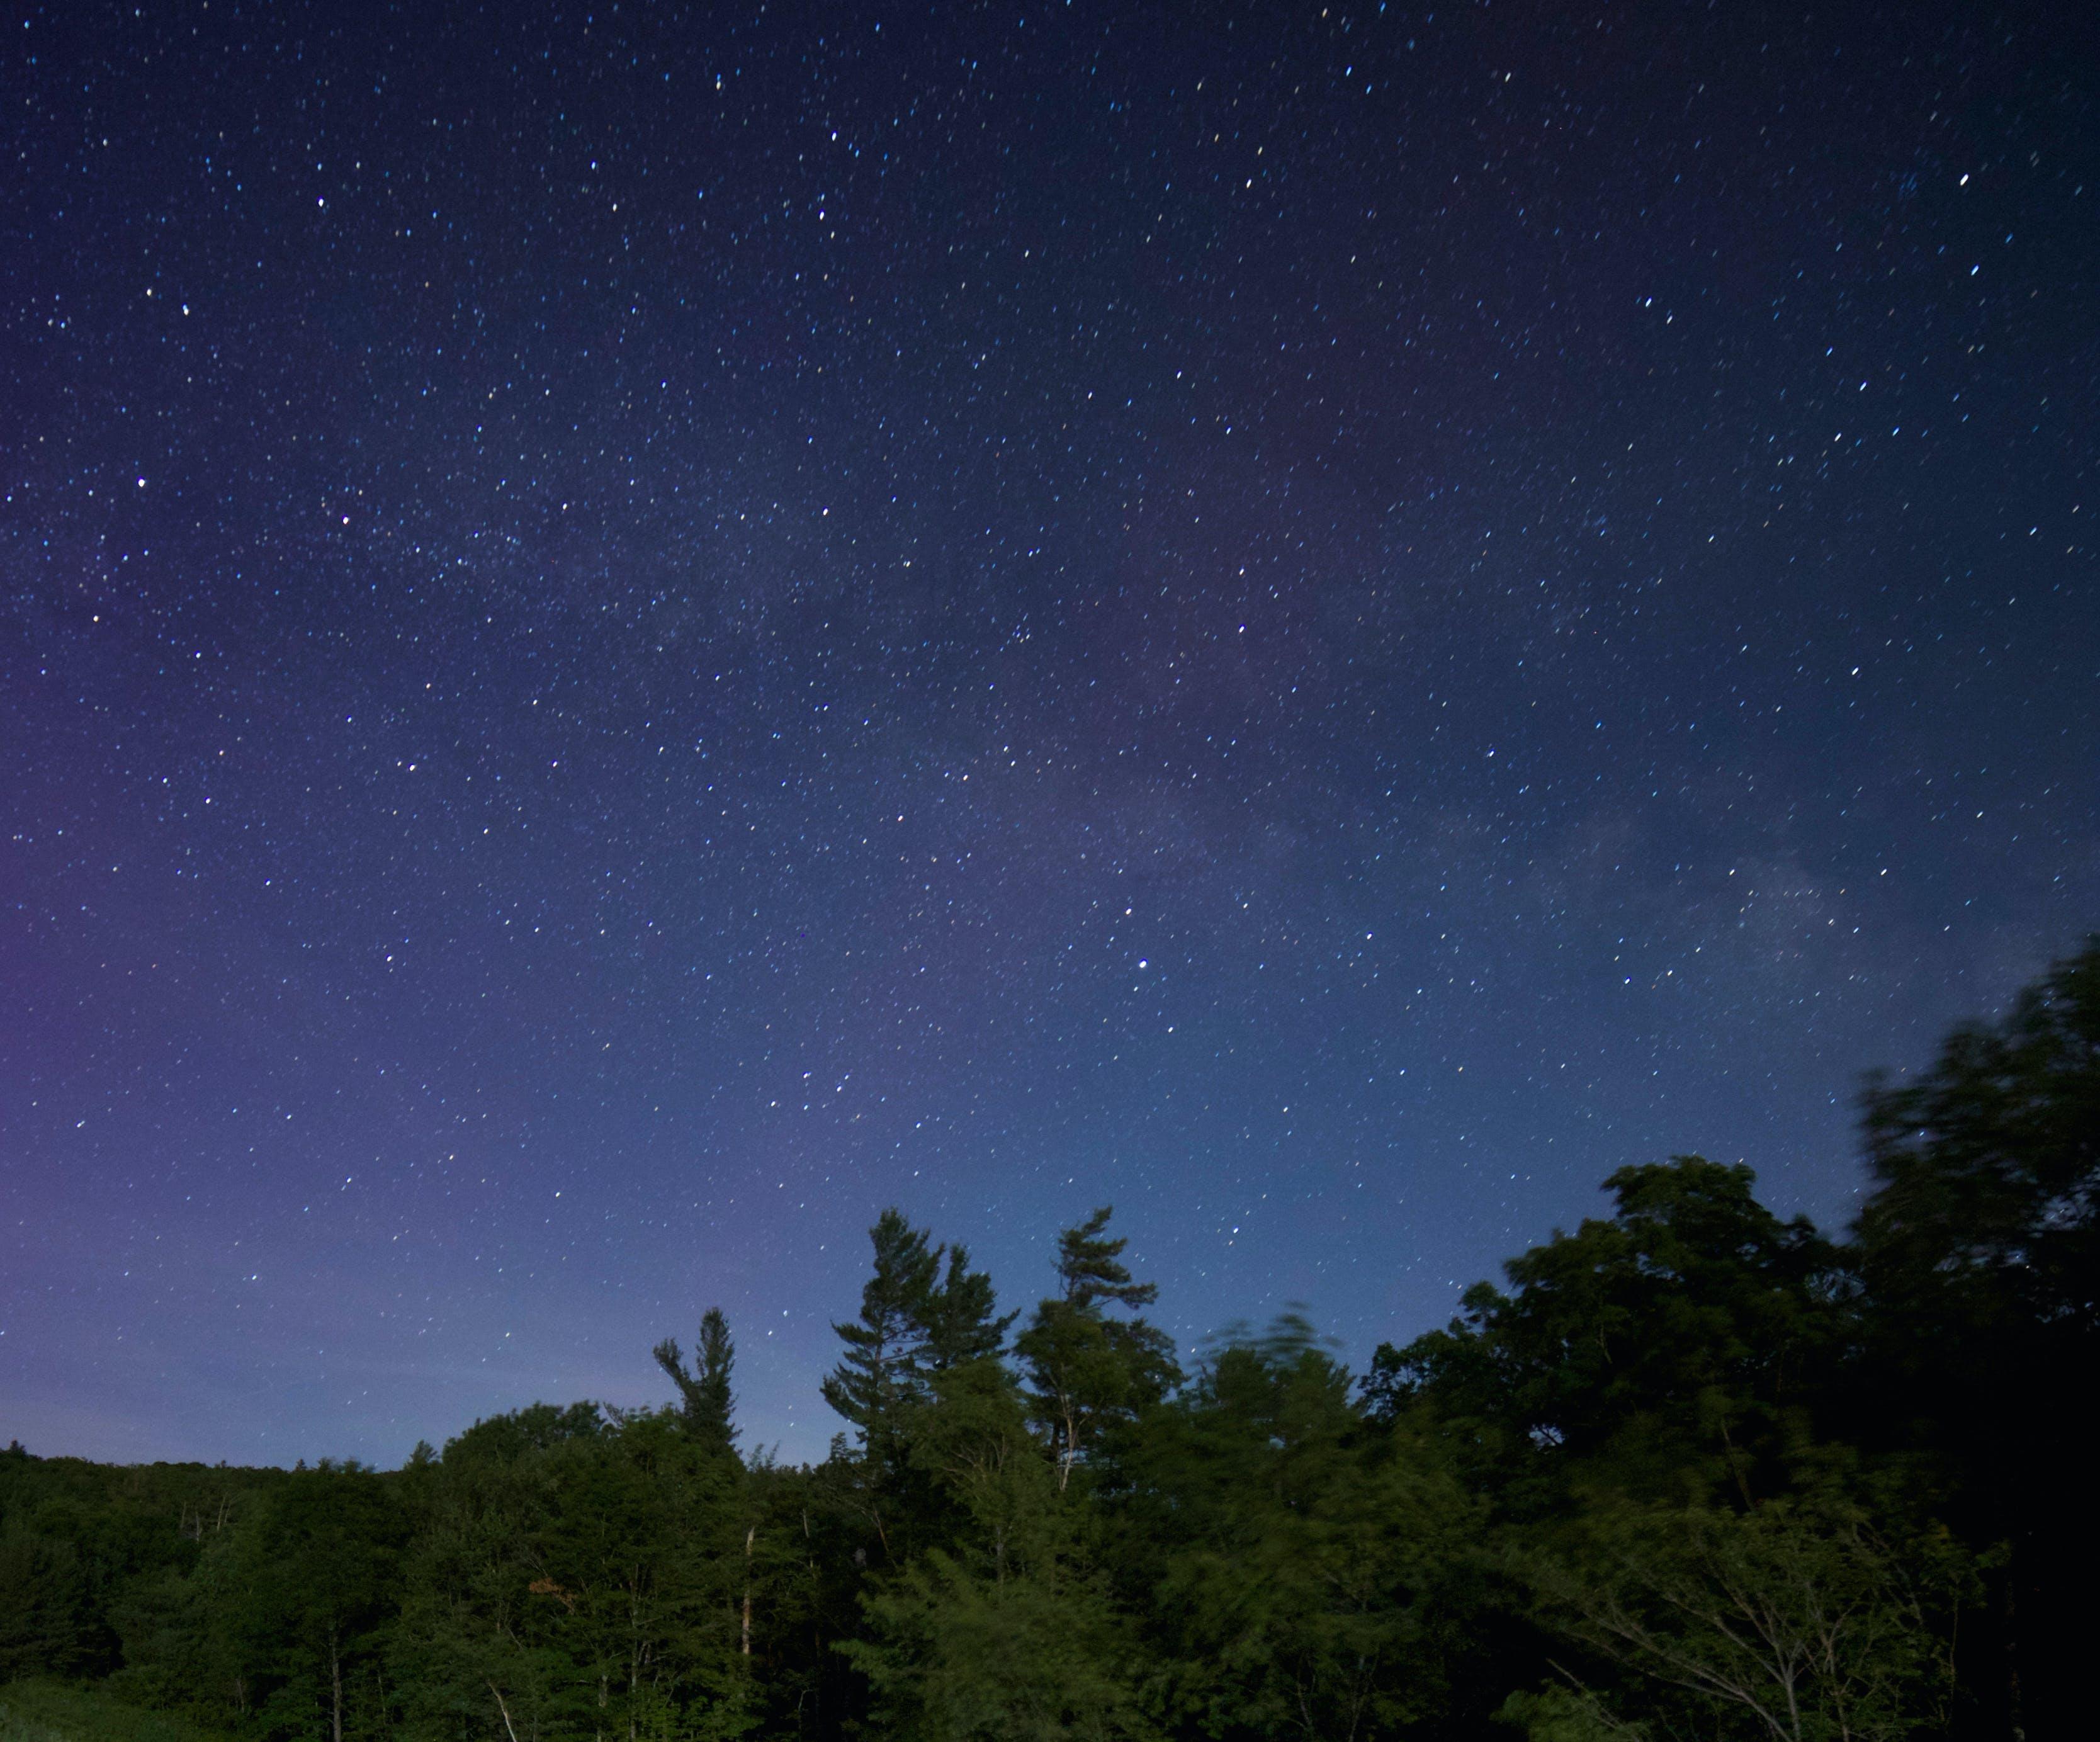 Green Trees Under Galaxy Stars